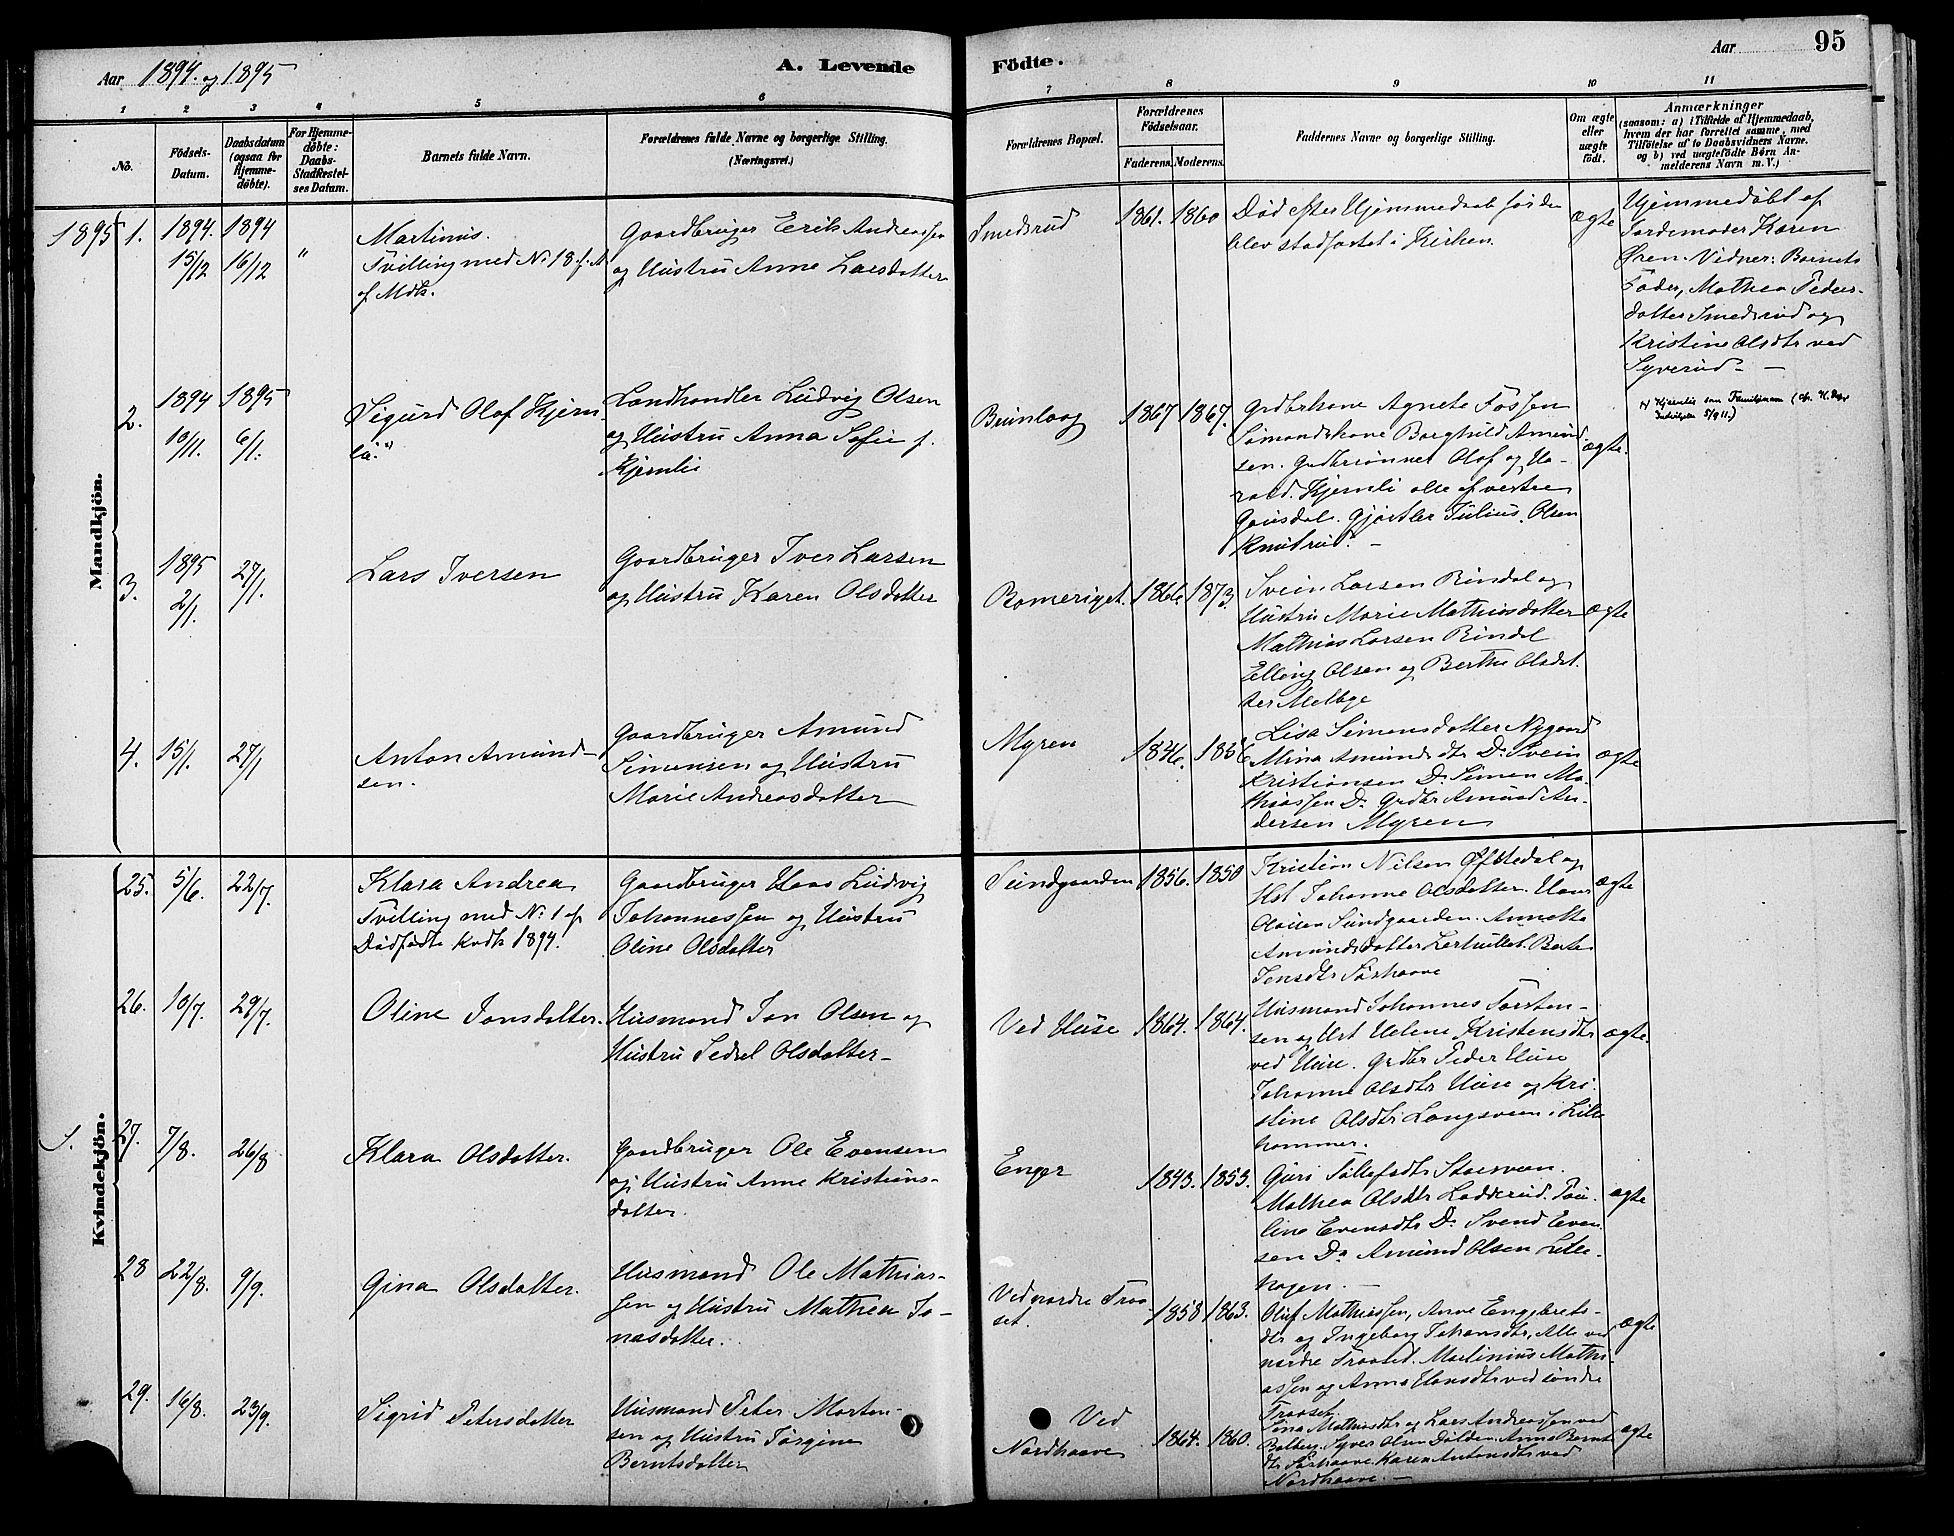 SAH, Fåberg prestekontor, Ministerialbok nr. 8, 1879-1898, s. 95